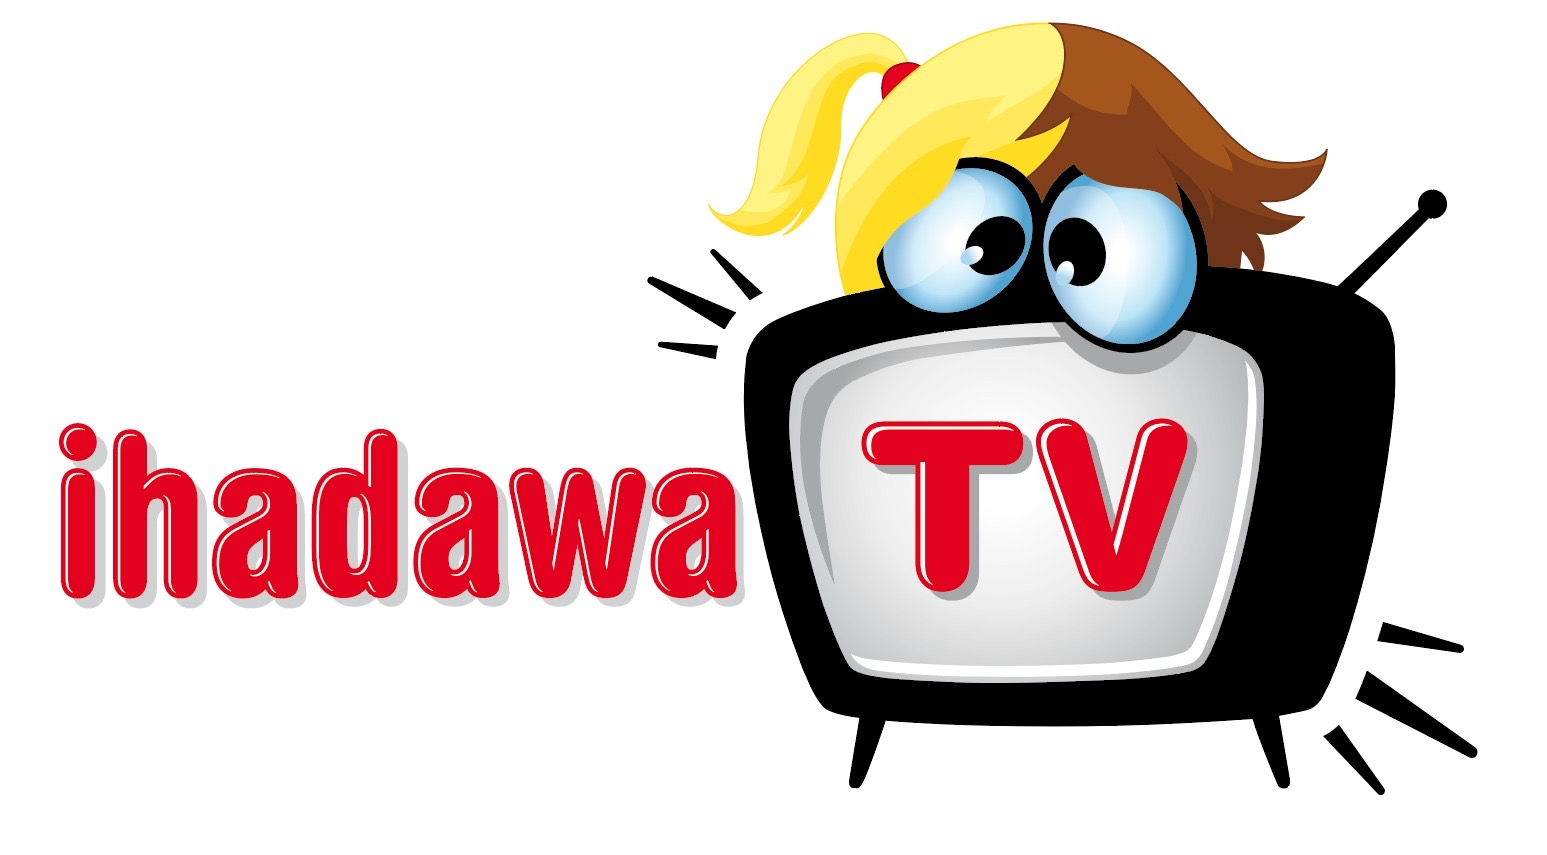 IhadawaTV Logo